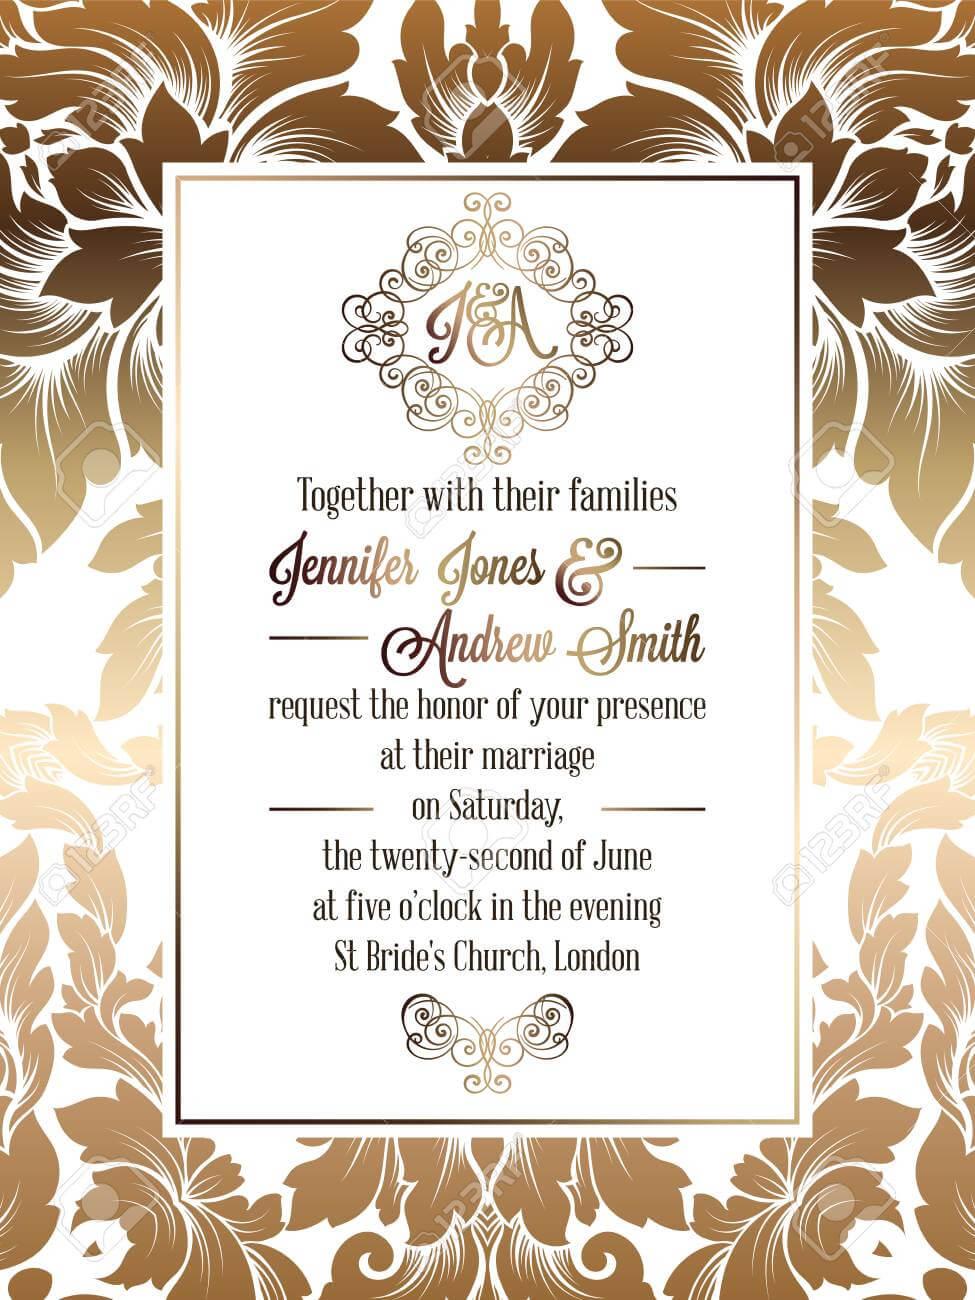 Vintage Baroque Style Wedding Invitation Card Template.. Elegant.. For Church Wedding Invitation Card Template